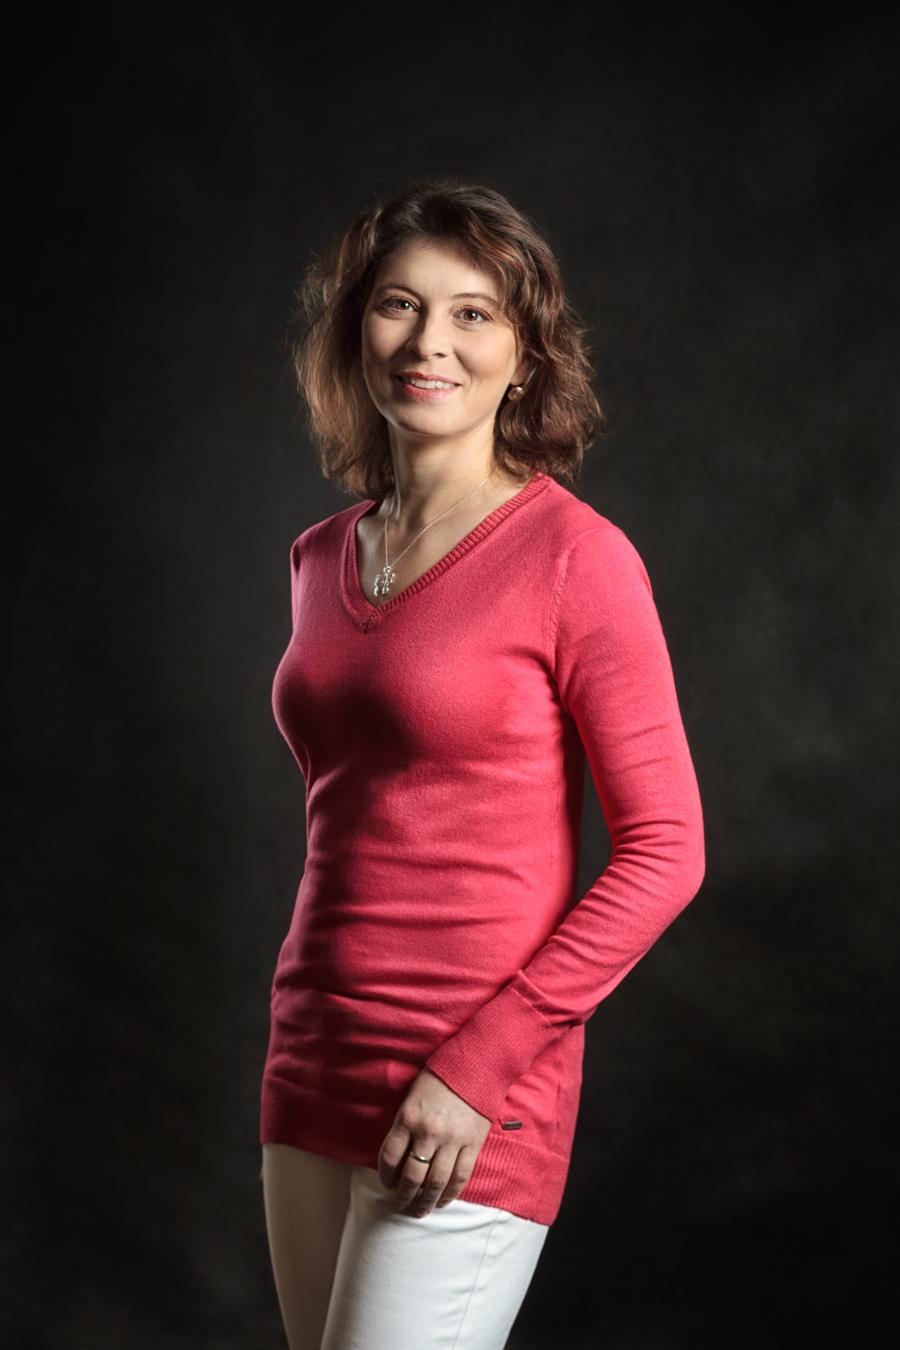 Jan Zeman profesionální portrétní fotograf Praha portrét